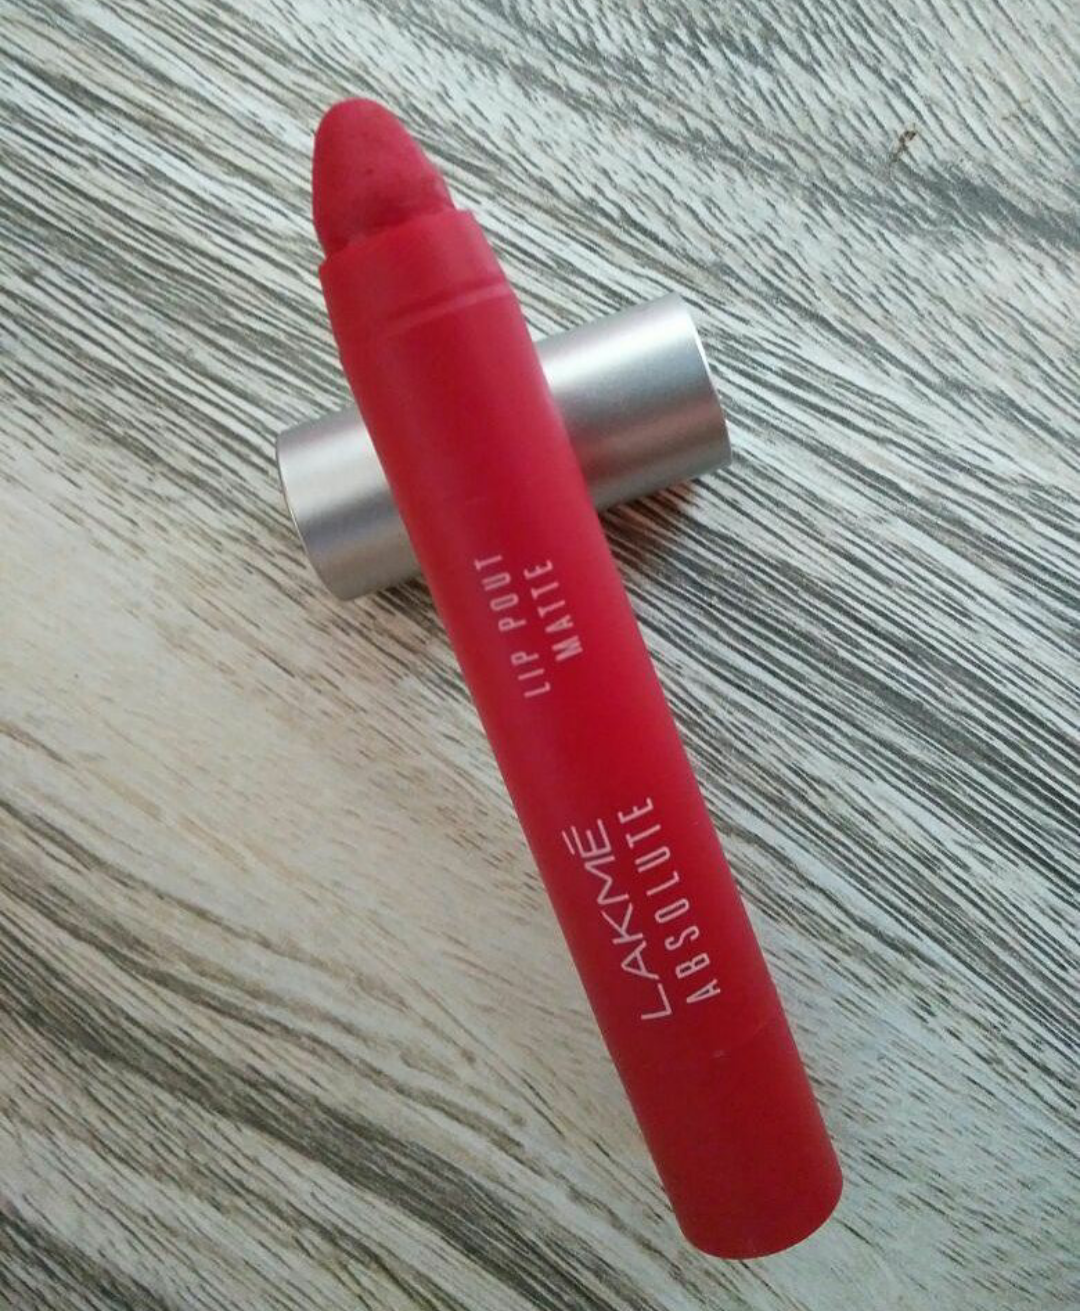 Lakme Absolute Lip Pout Matte Lip Color-Creamy, rectractable crayon lipstick.-By ankita_agarwal